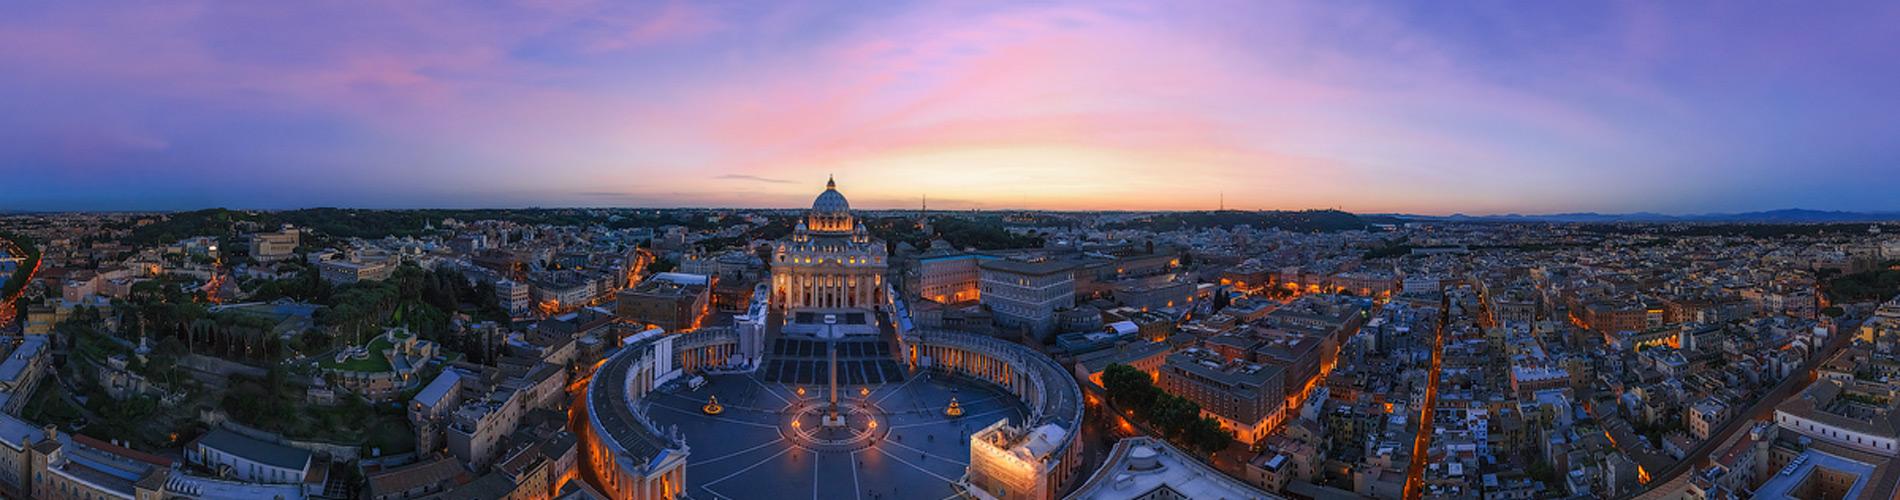 B&B Roma vaticano